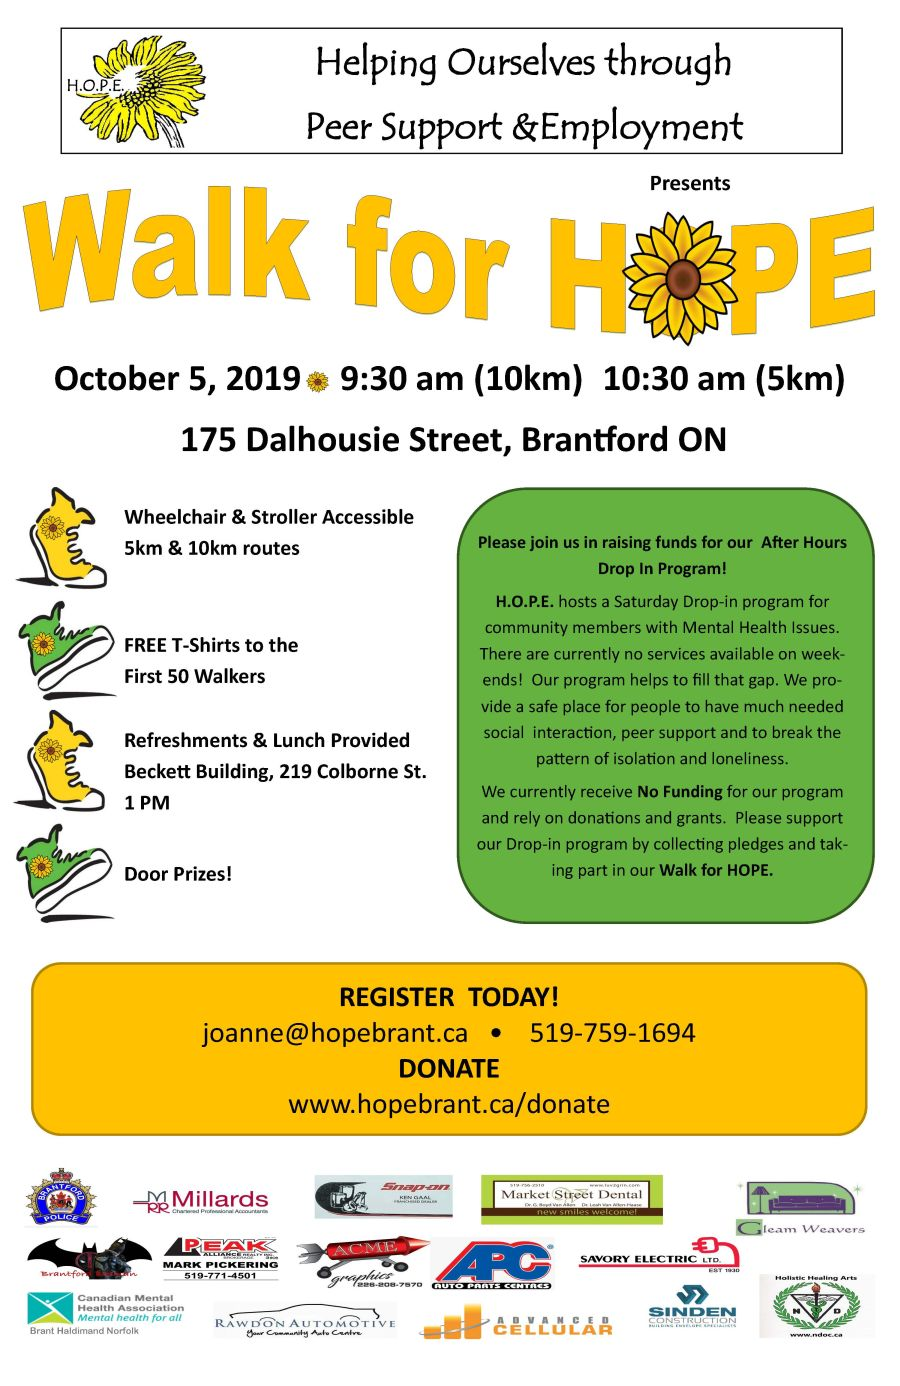 Walk for HOPE poster